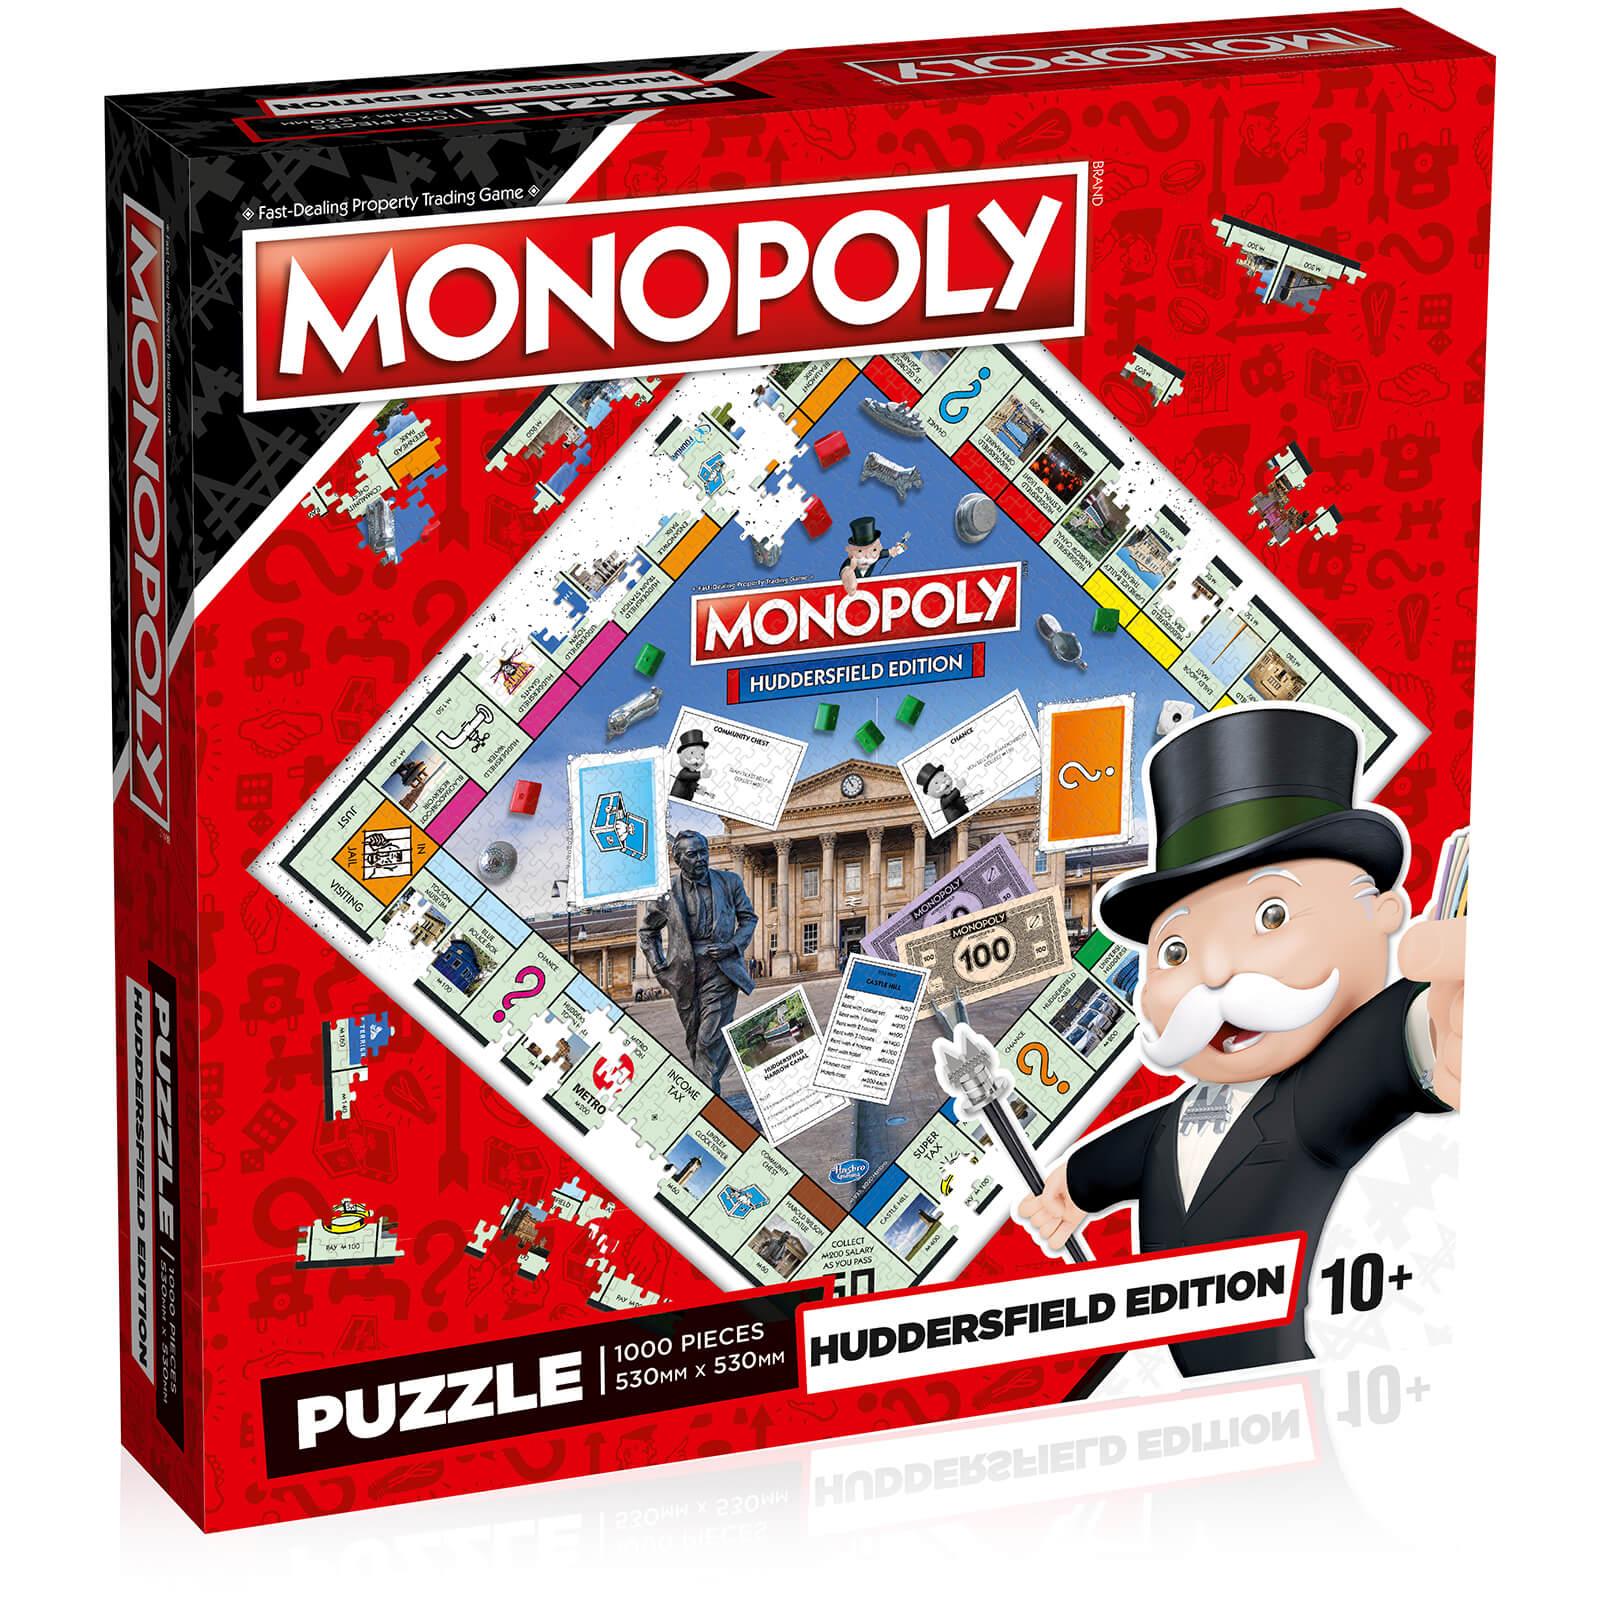 Image of Huddersfield Monopoly Jigsaw